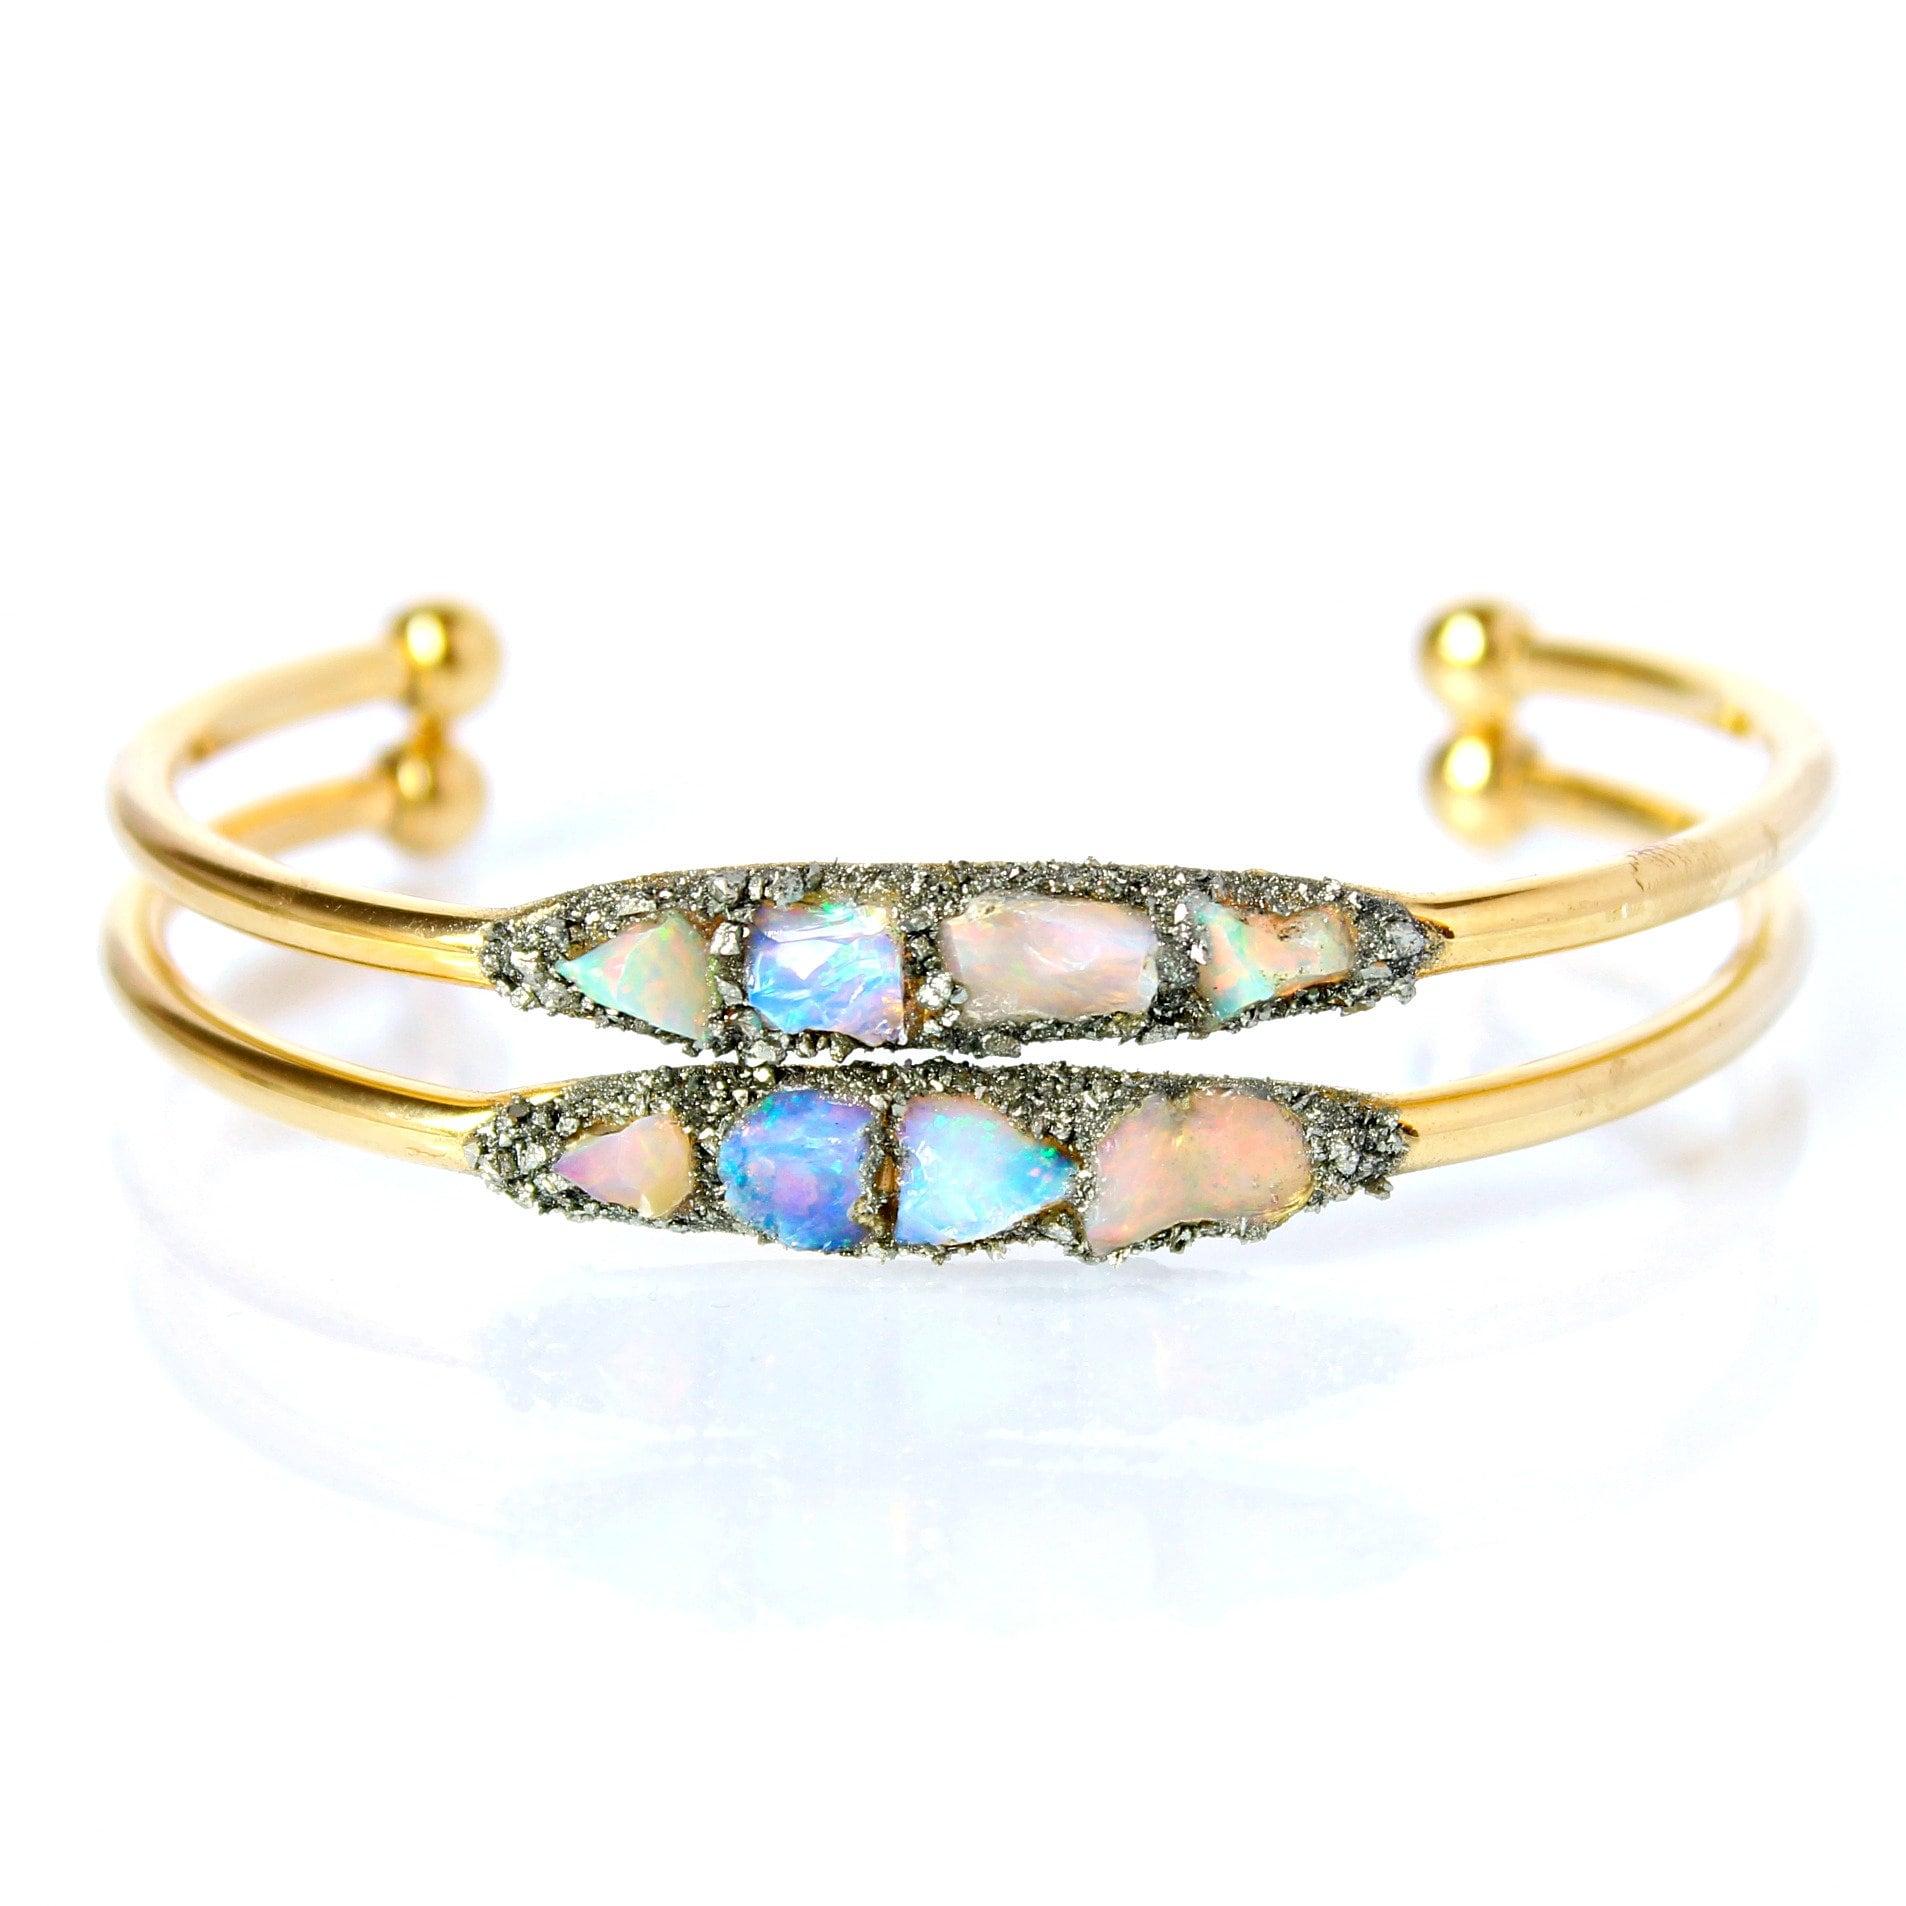 October Opal Jewelry / Gold Opal Jewelry / Opal Bracelet / Australian Opal Jewelry / Opal Jewelry for Wife / Opal Gift for Wife / Raw Opal